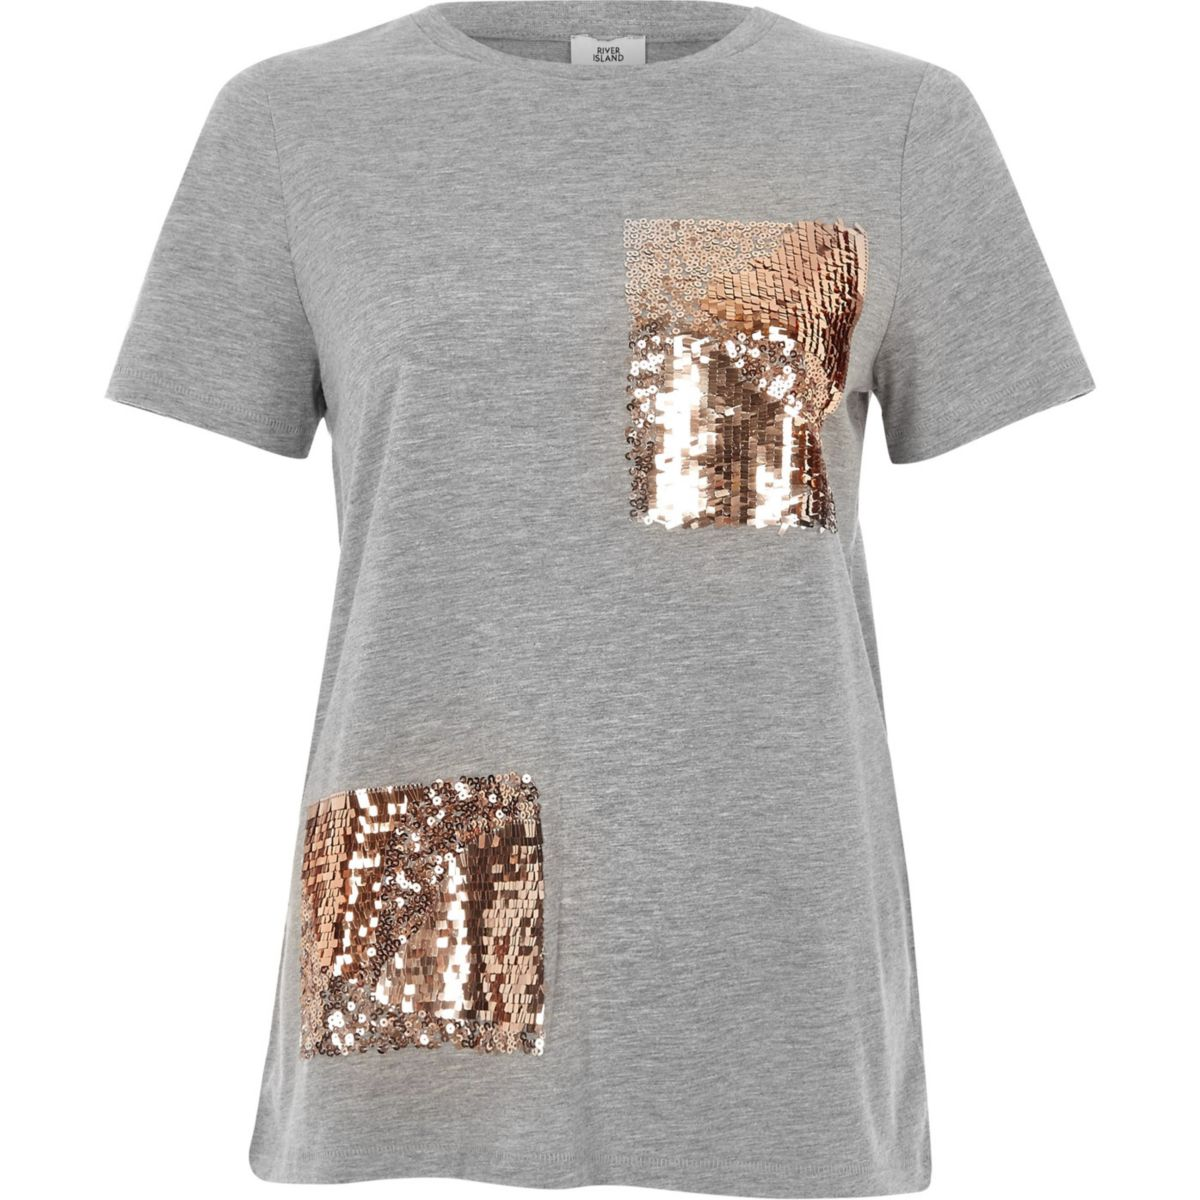 Hellgraues, paillettenverziertes T-Shirt